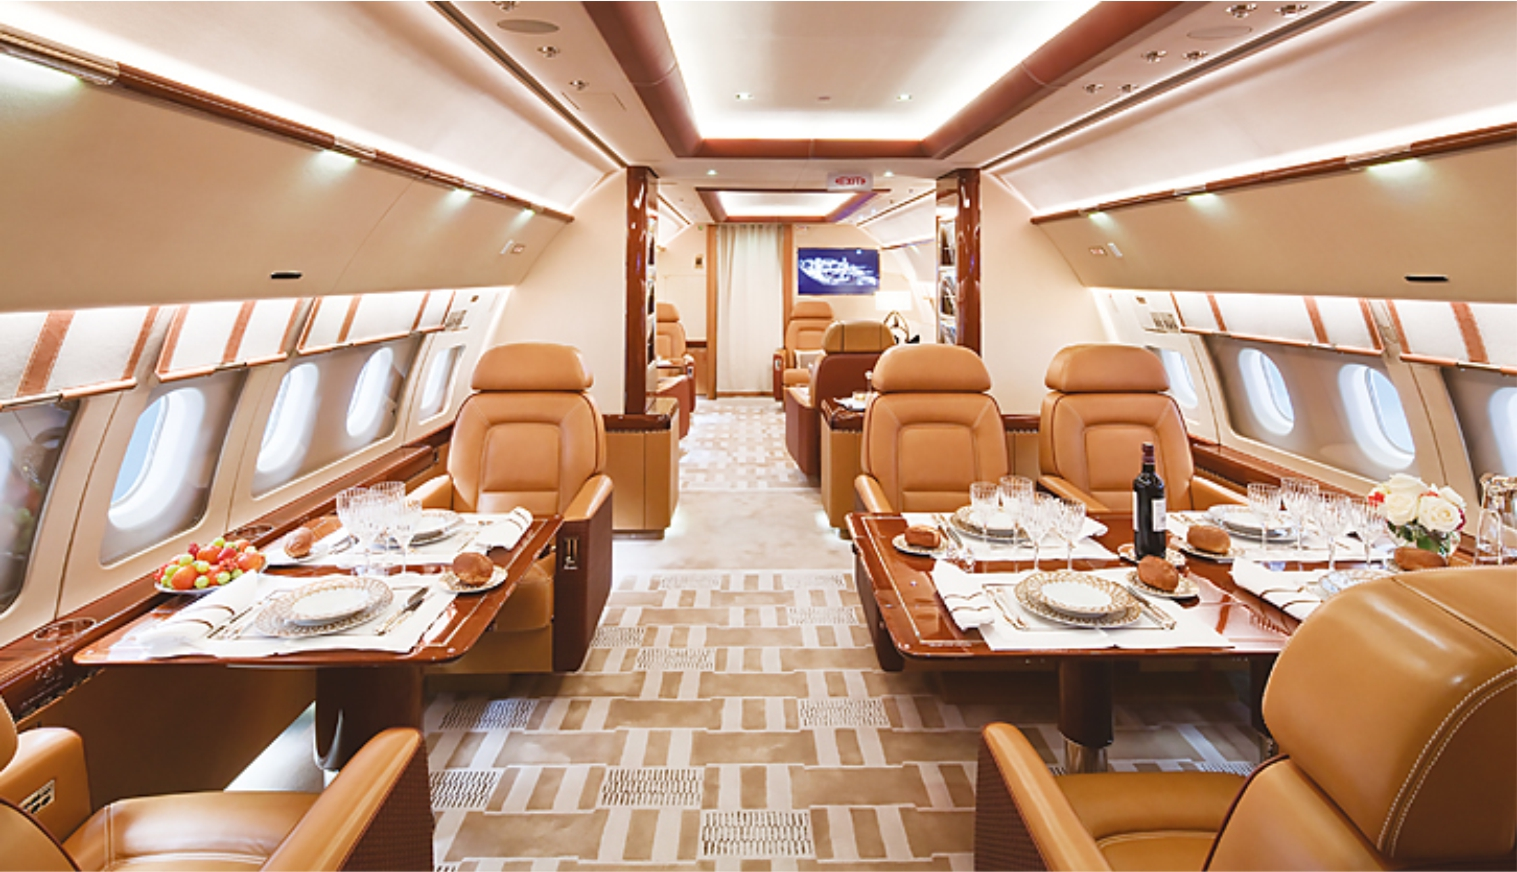 Aviation Carpets & Rugs Custom Designs | Brabetz Rug